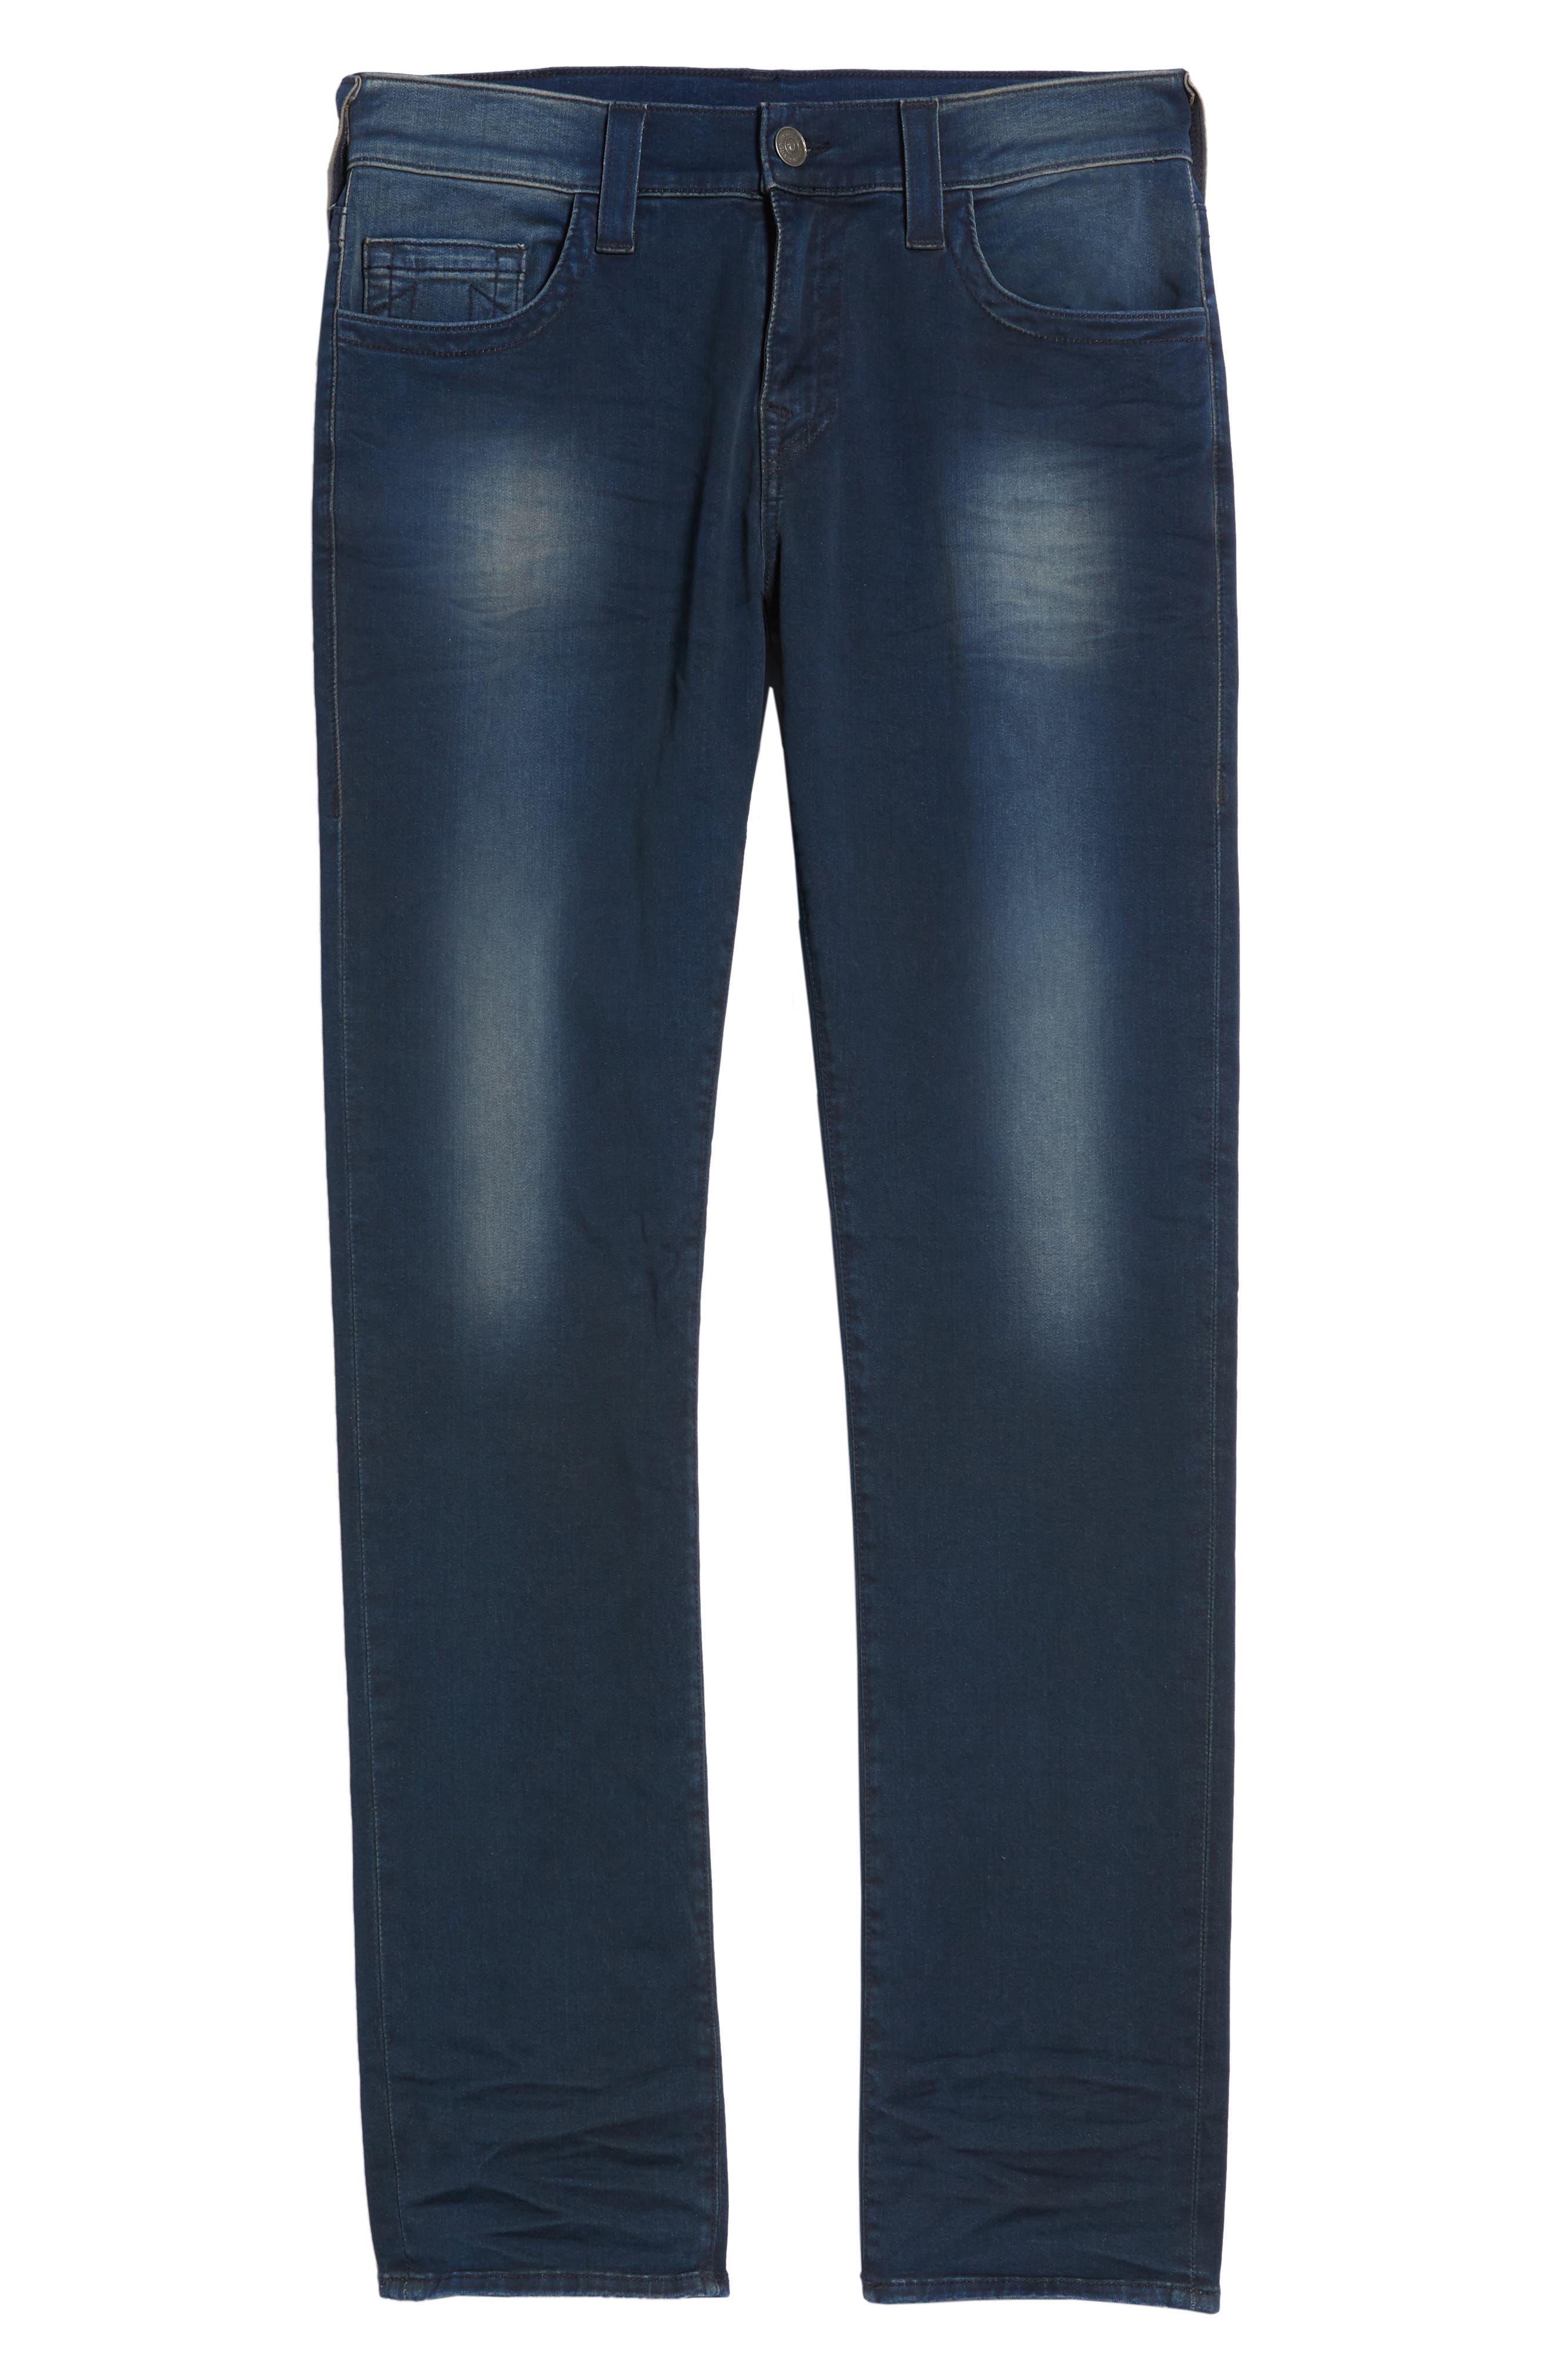 Geno Straight Leg Jeans,                             Alternate thumbnail 6, color,                             Dark Navy